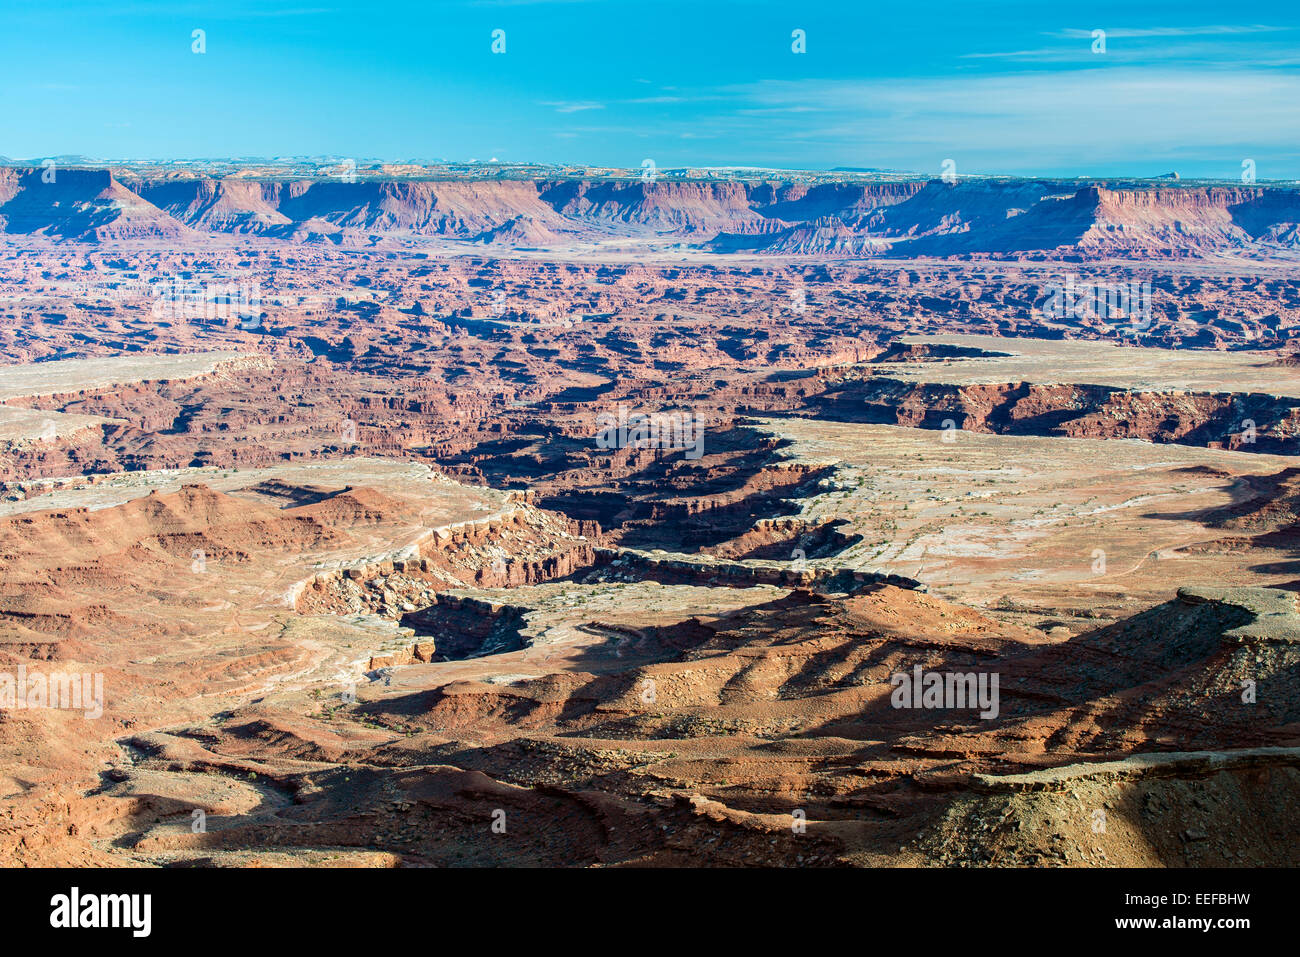 Grand View Point Overlook, Canyonlands National Park, Utah, USA Stockbild